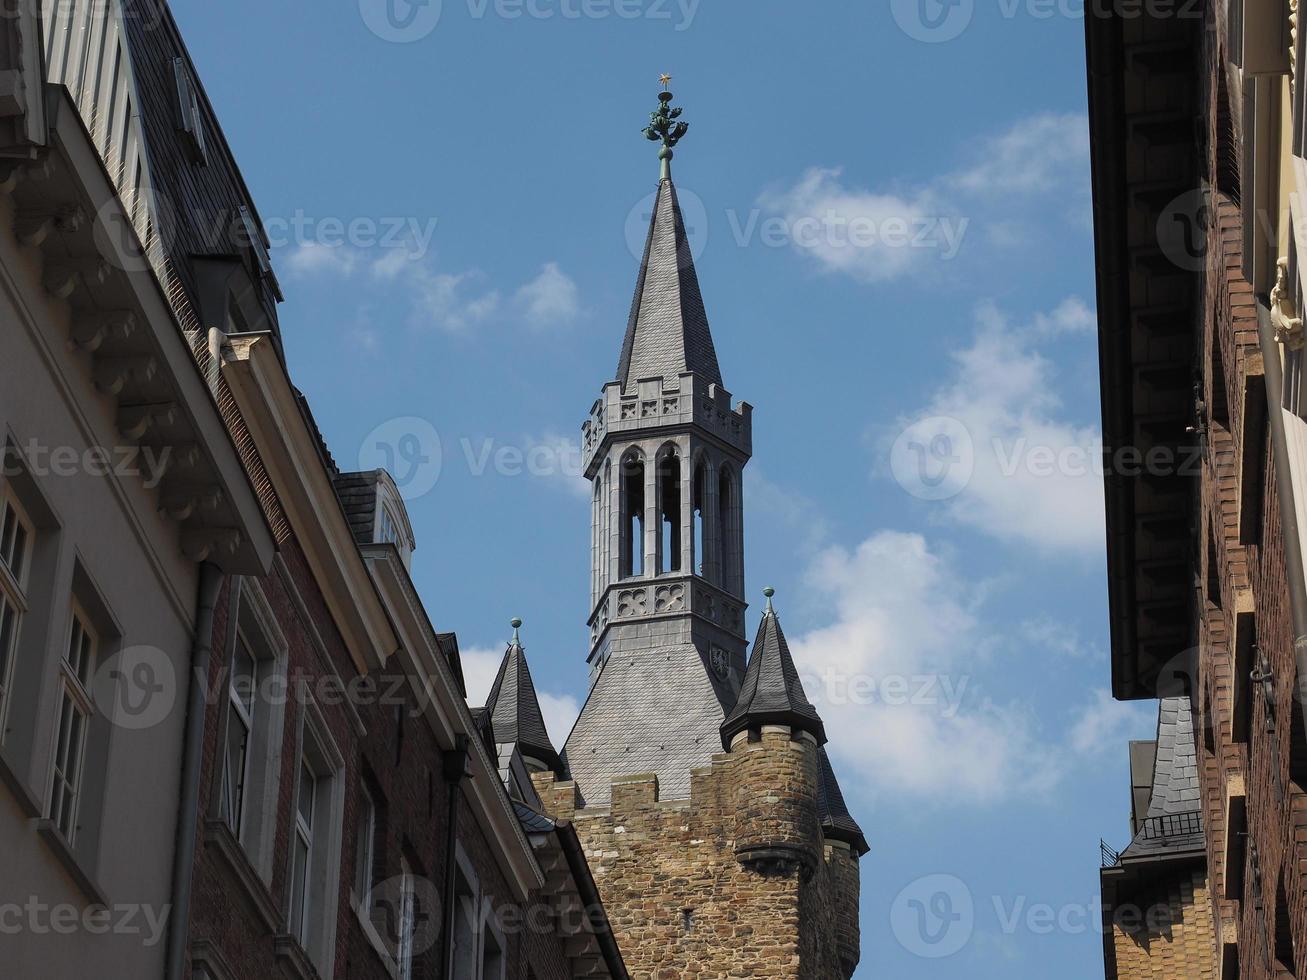 torre turm der alte pfalzanlage do antigo palatinado em aachen foto